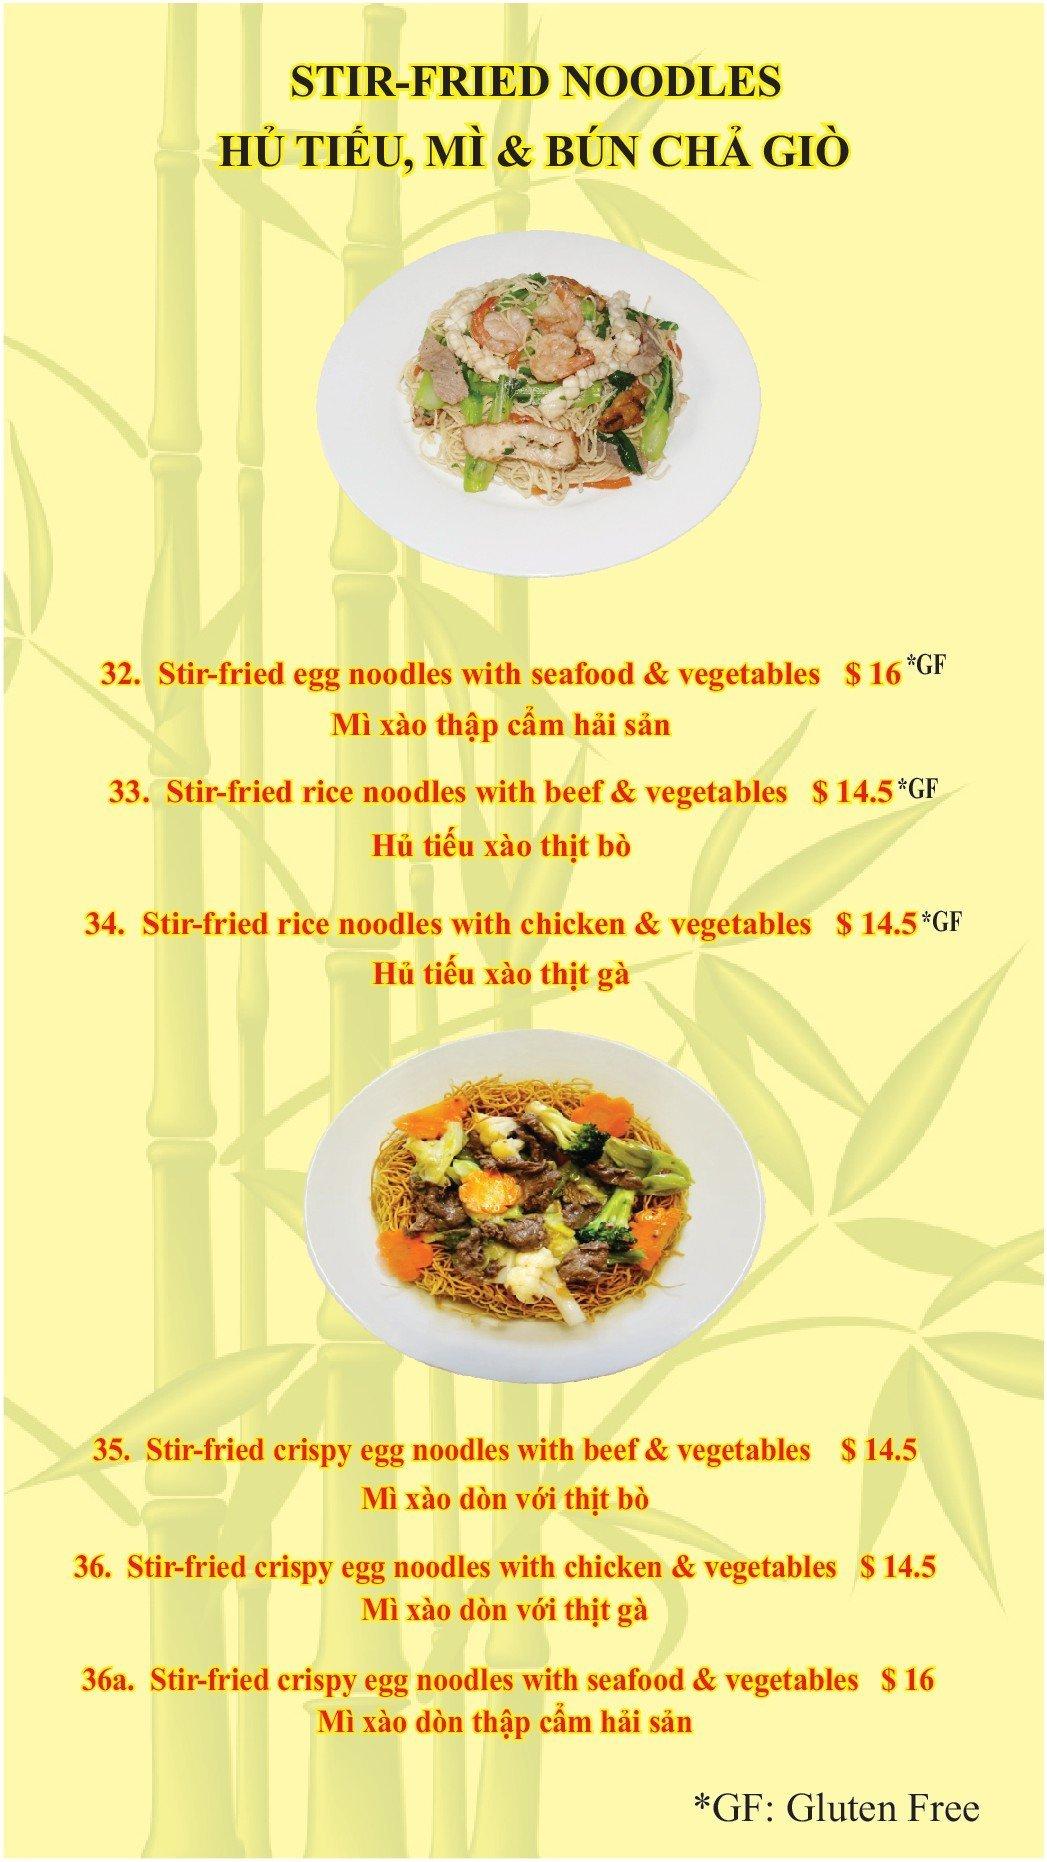 Stir fried noodles menu